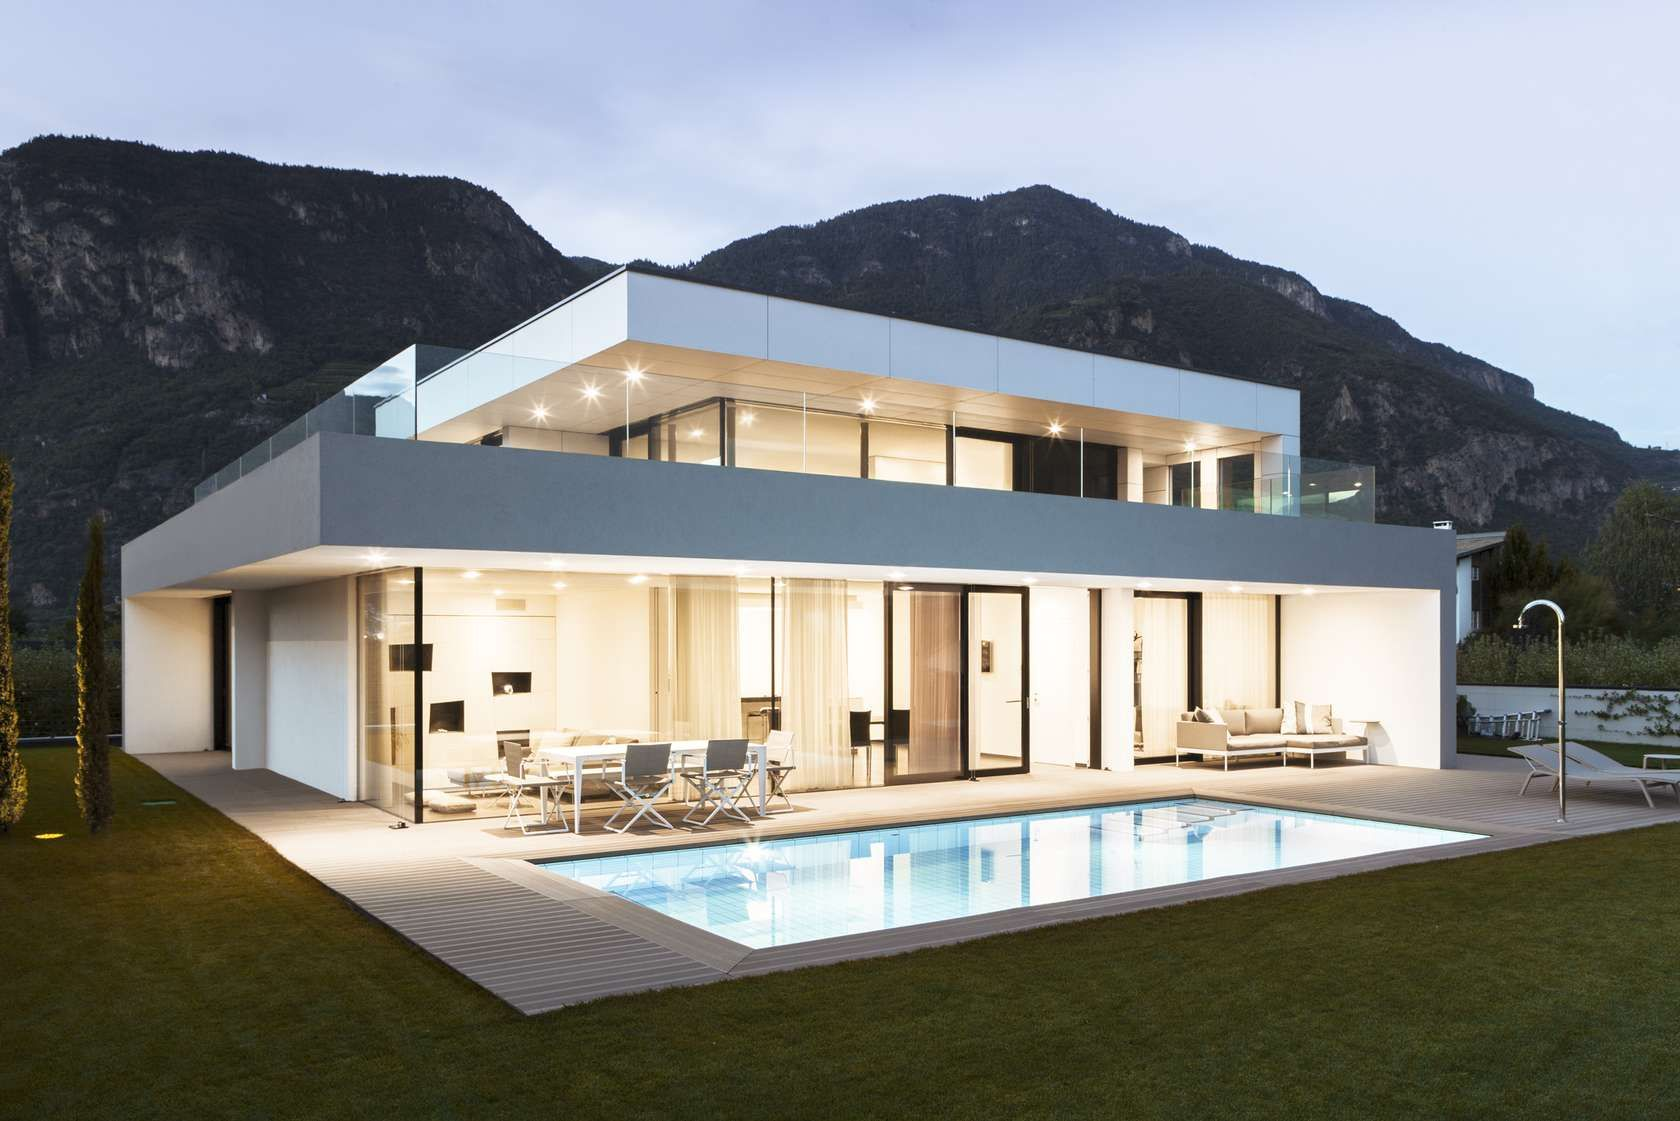 B Z Design Home Part - 30: House / Monovolume Architecture + Design, Bozen, BZ, Italy By Frankie